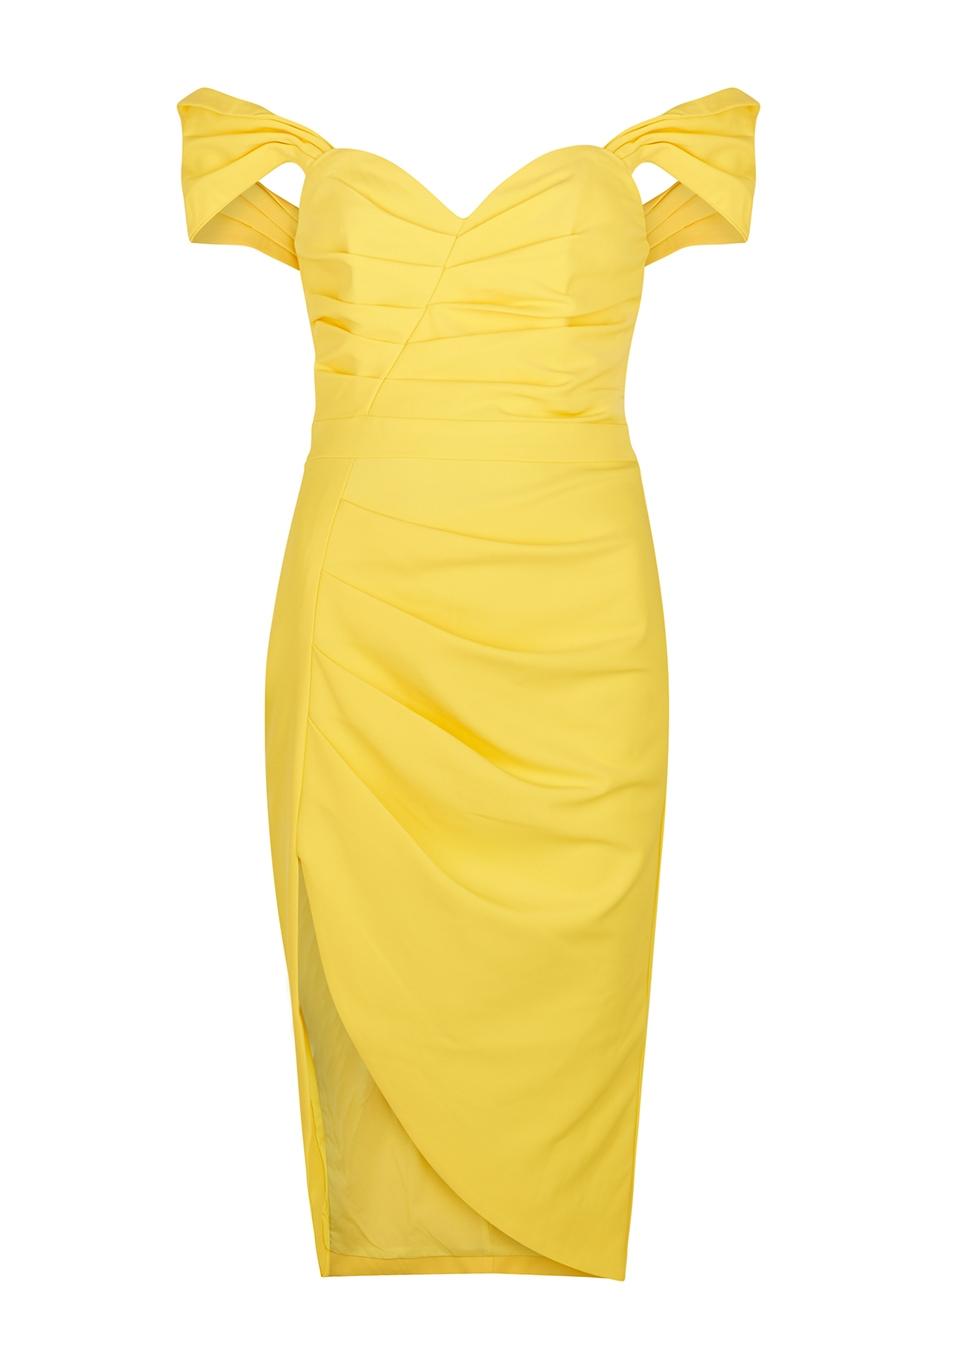 Bright yellow off-the-shoulder midi dress